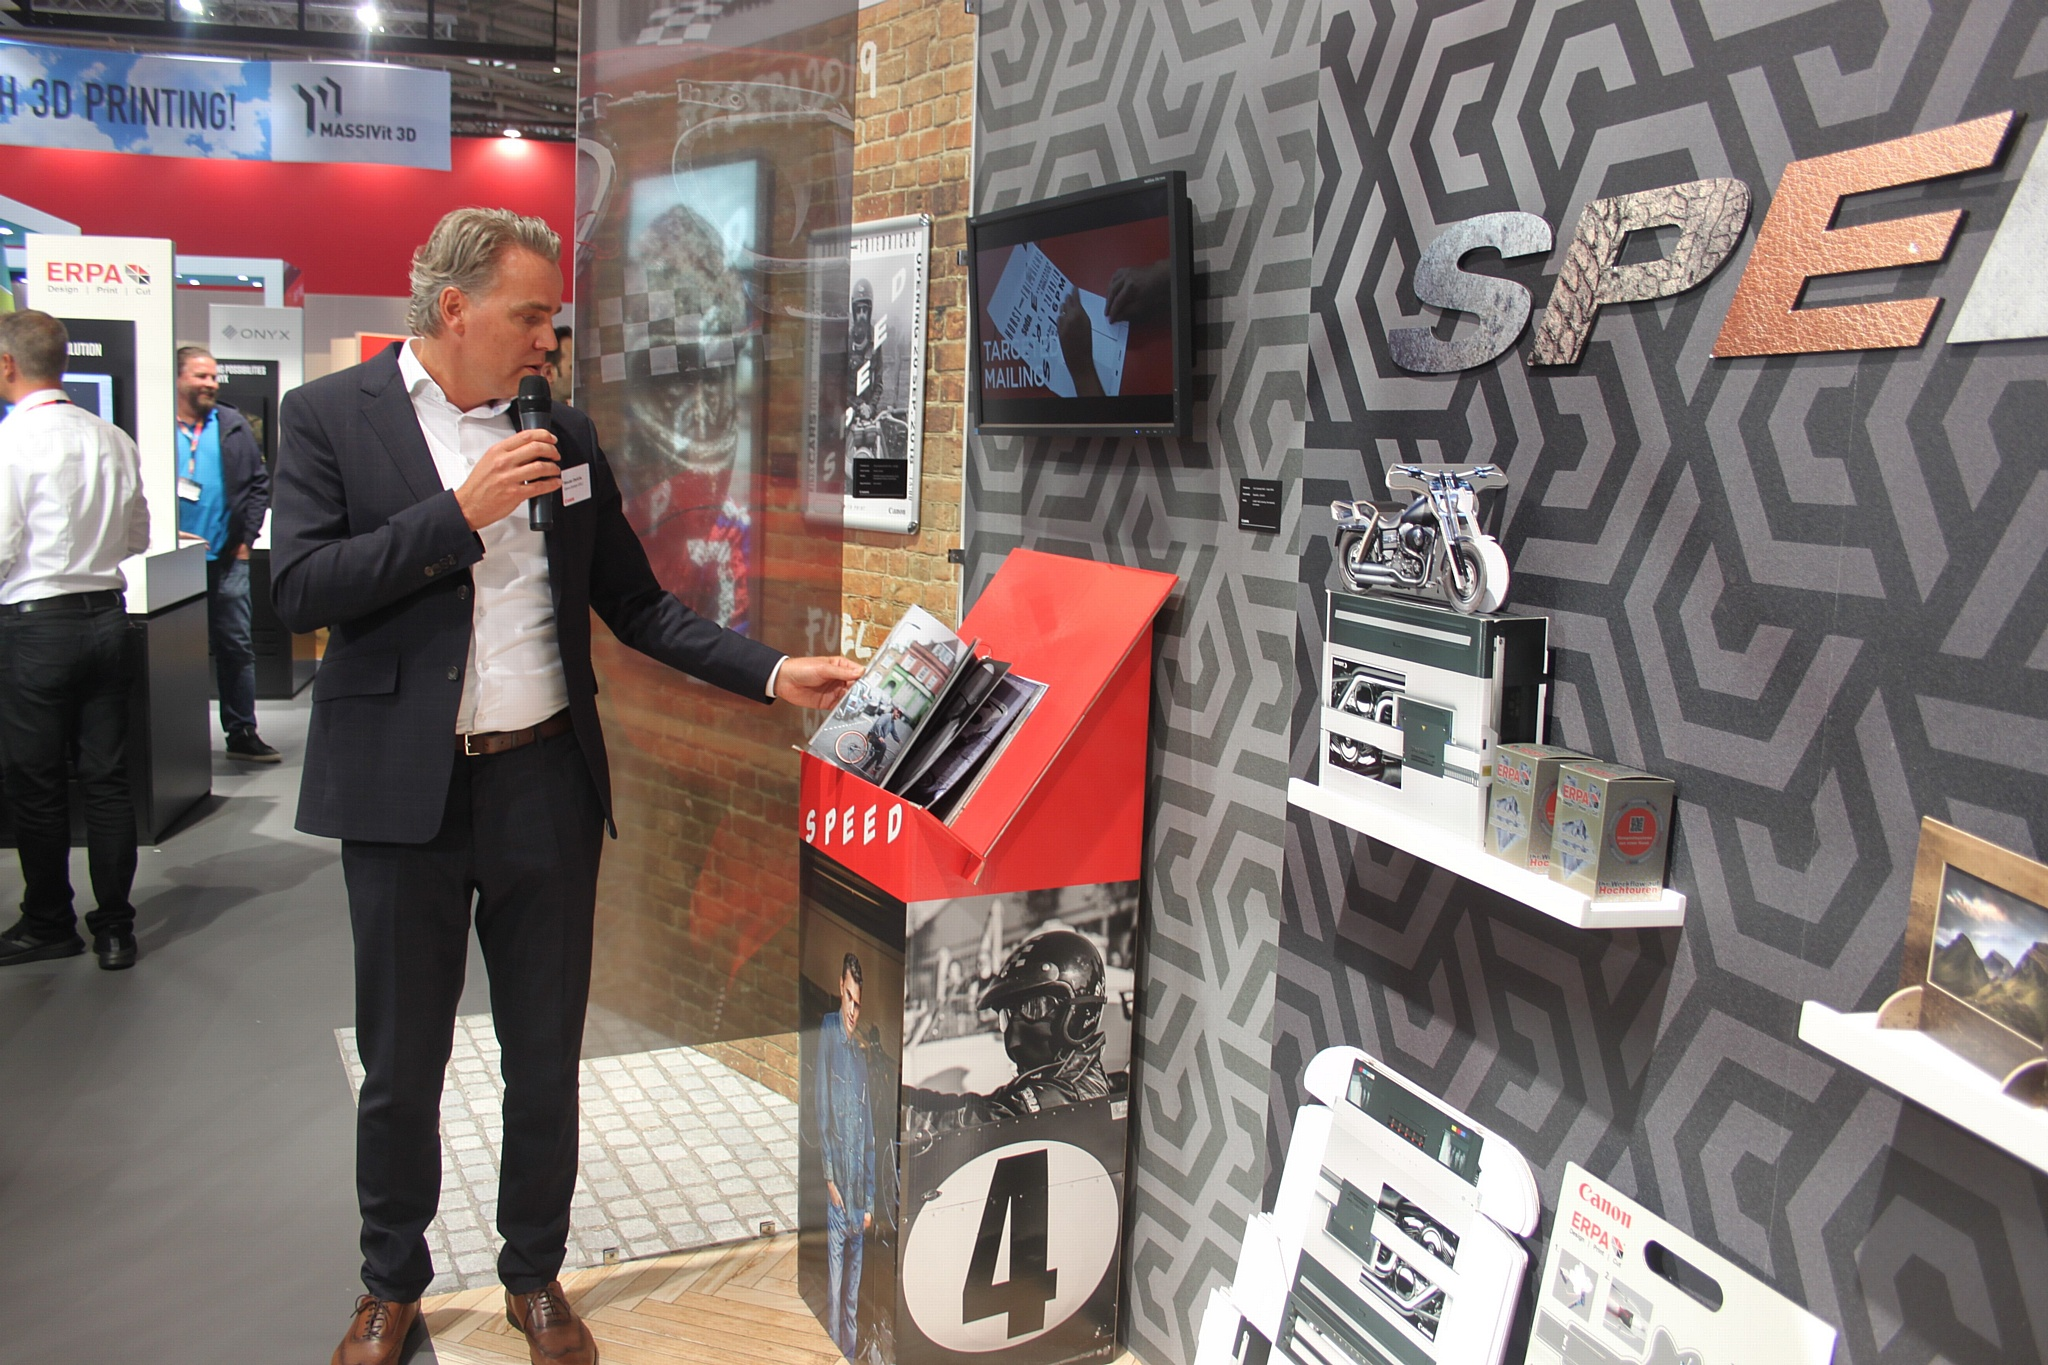 Canon добавил эмоций на выставке Fespa 2019